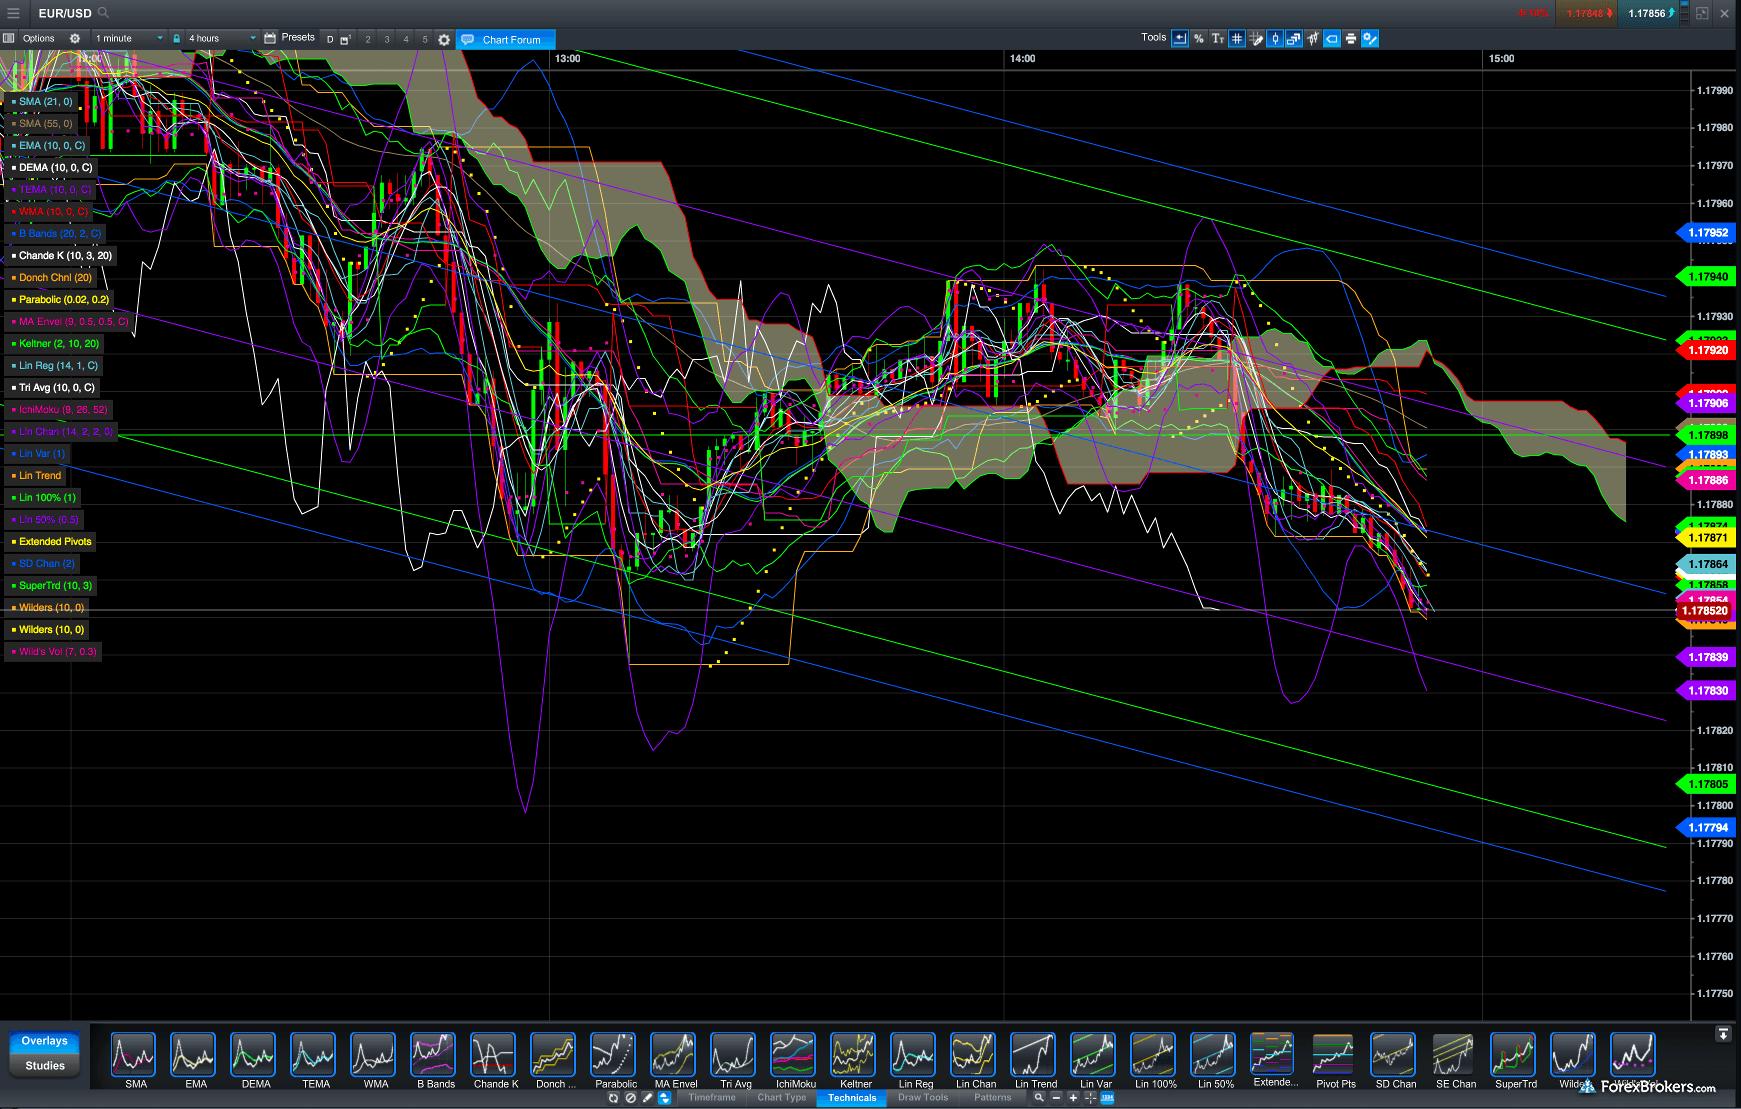 Options trading cmc